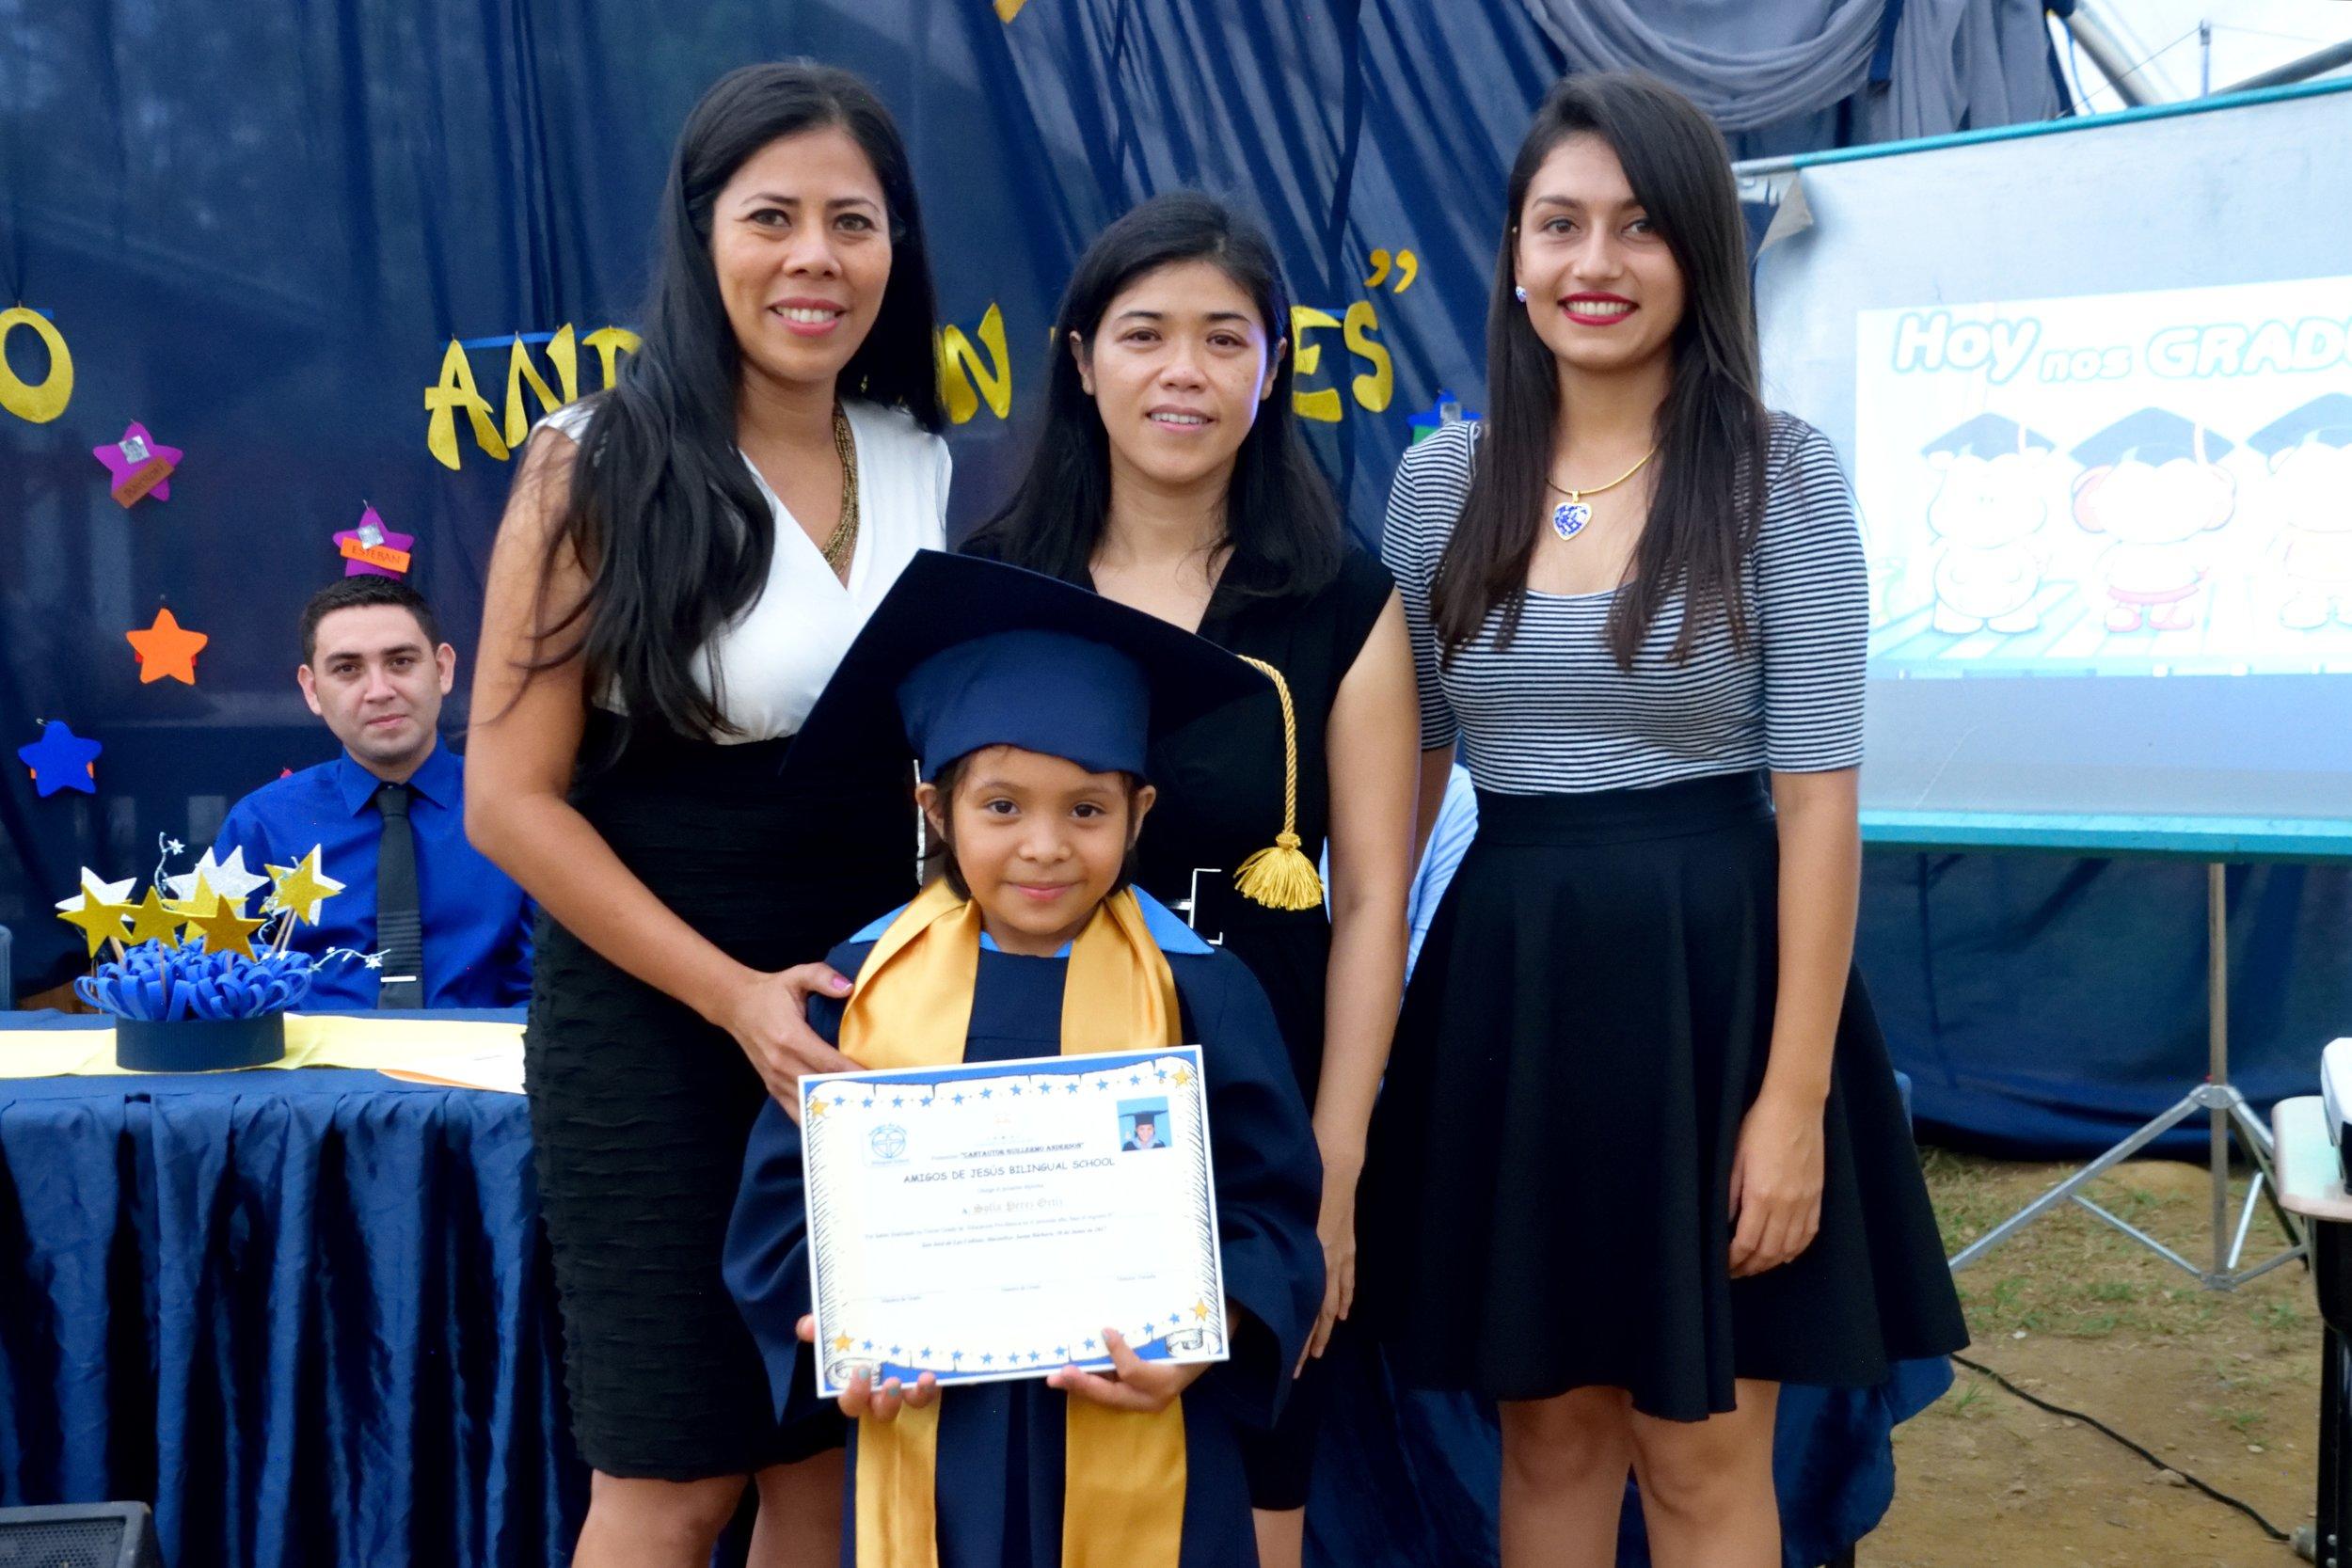 With her three 'Prepa' teachers during graduation last June.